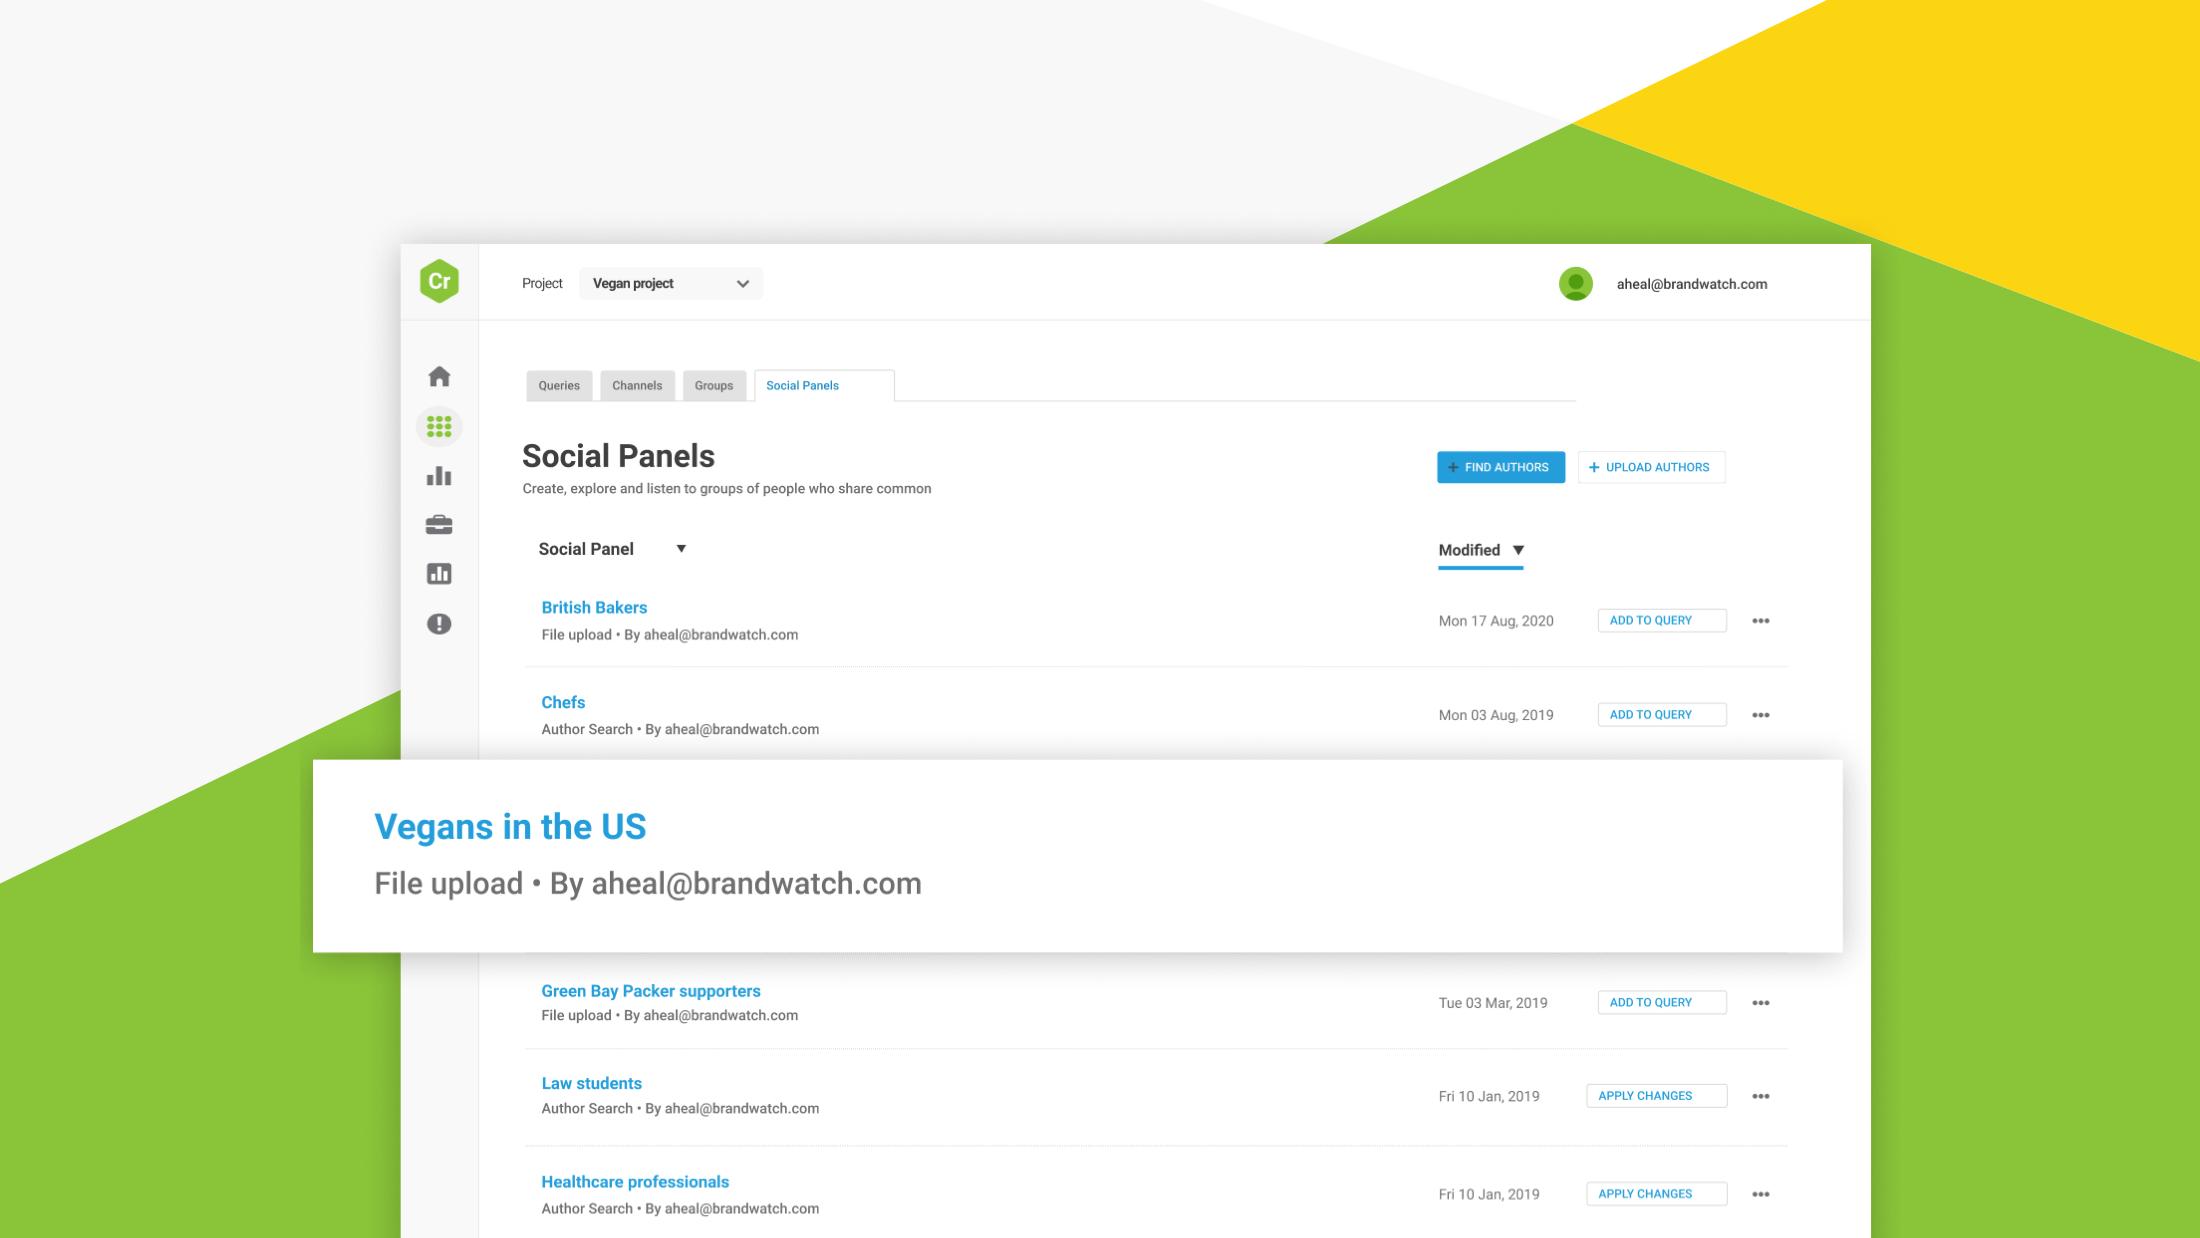 Introducing Social Panels: Understanding Your Consumers Just Got Simpler